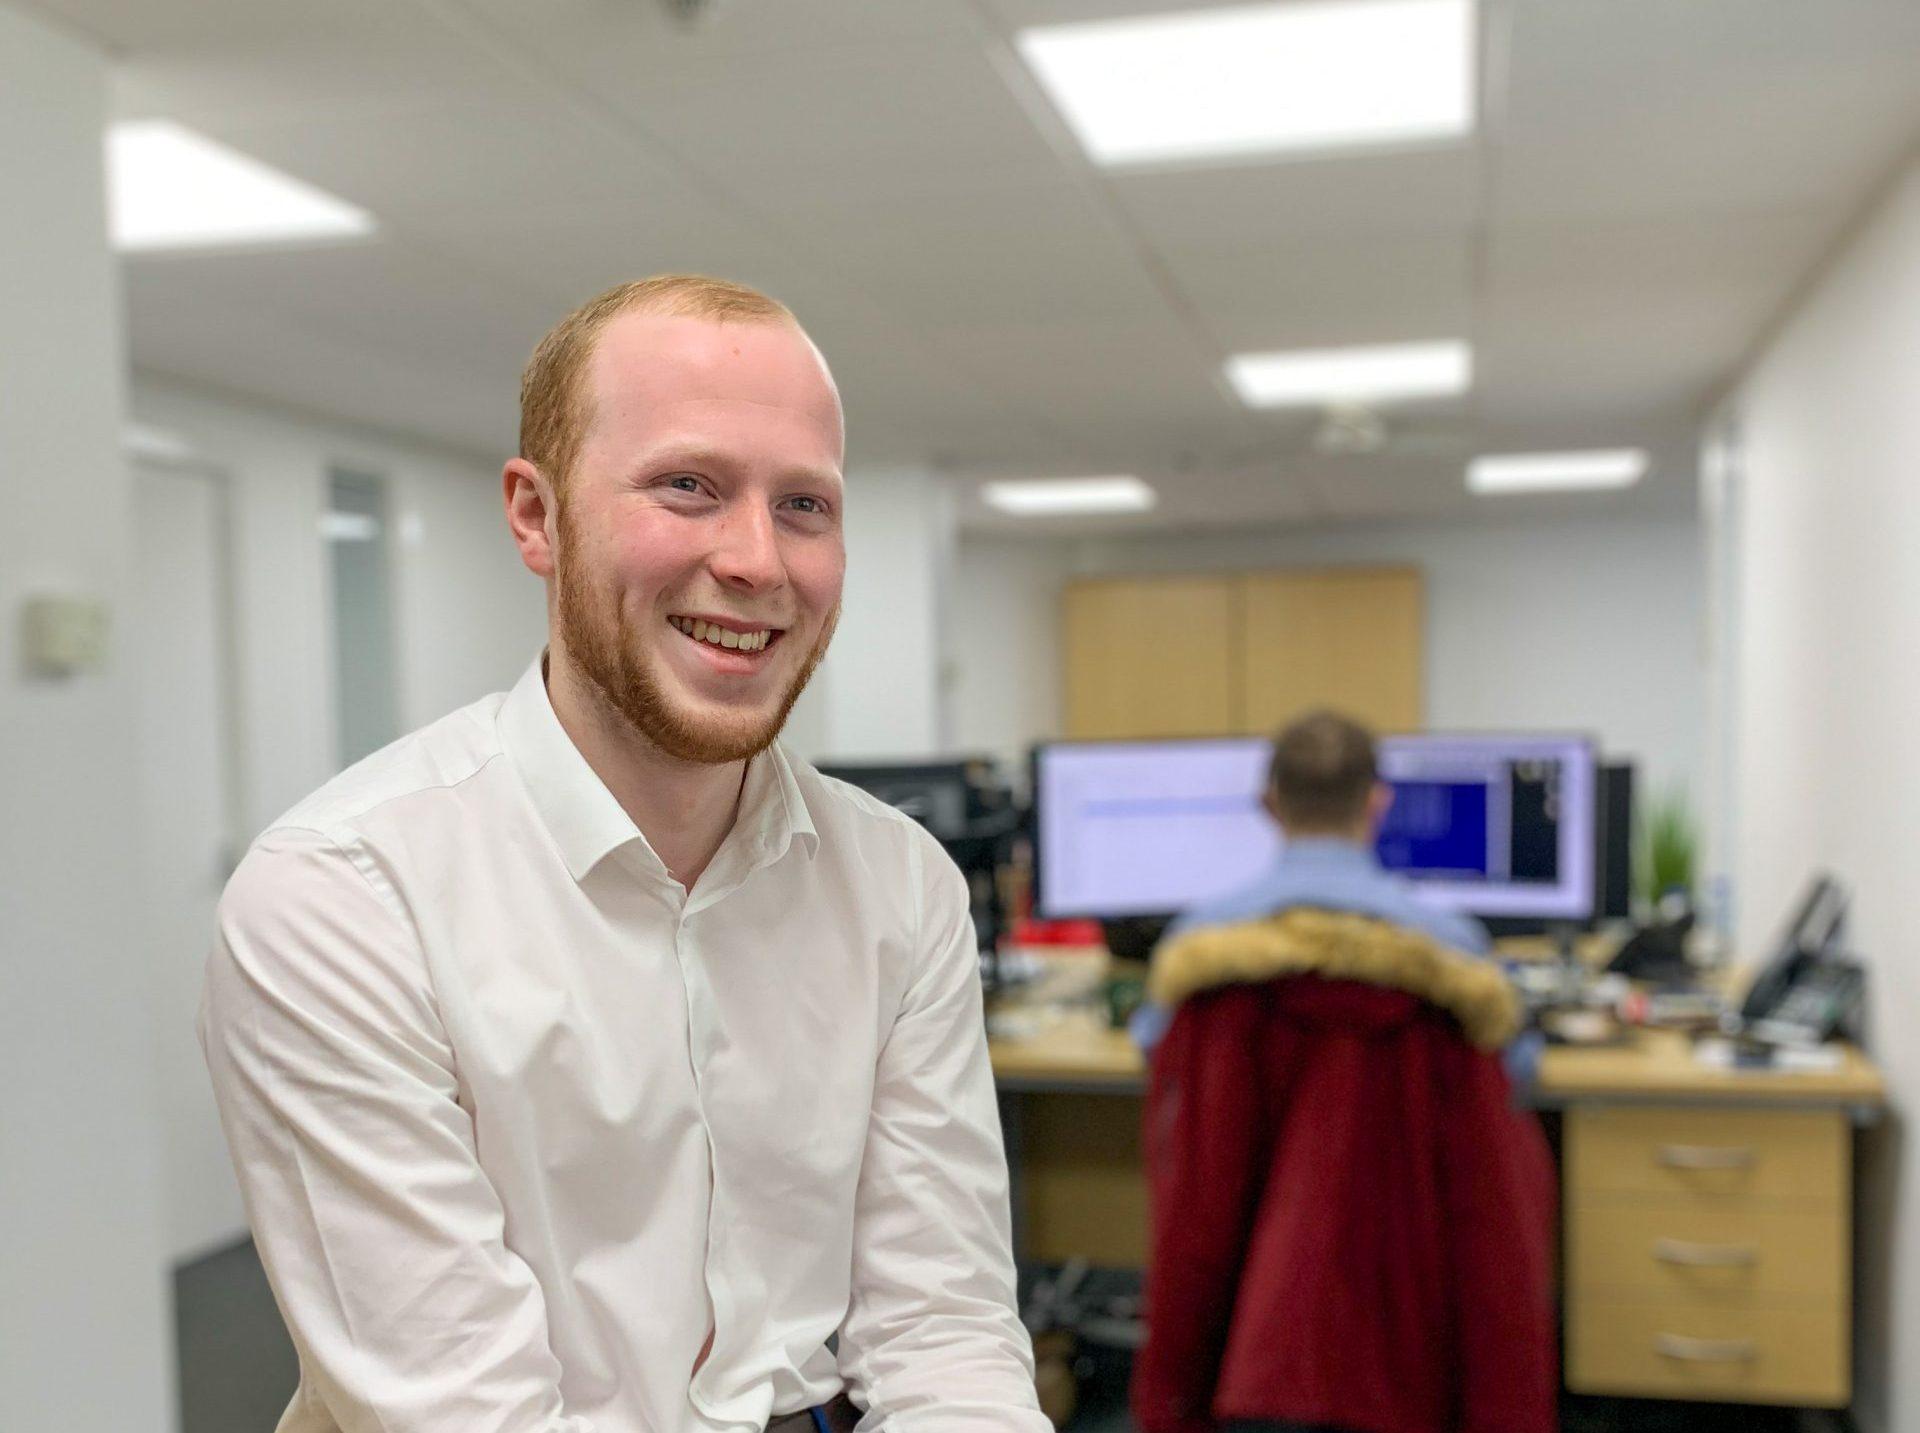 Euan IT Foundations Edinburgh IT Support Technical Specialist